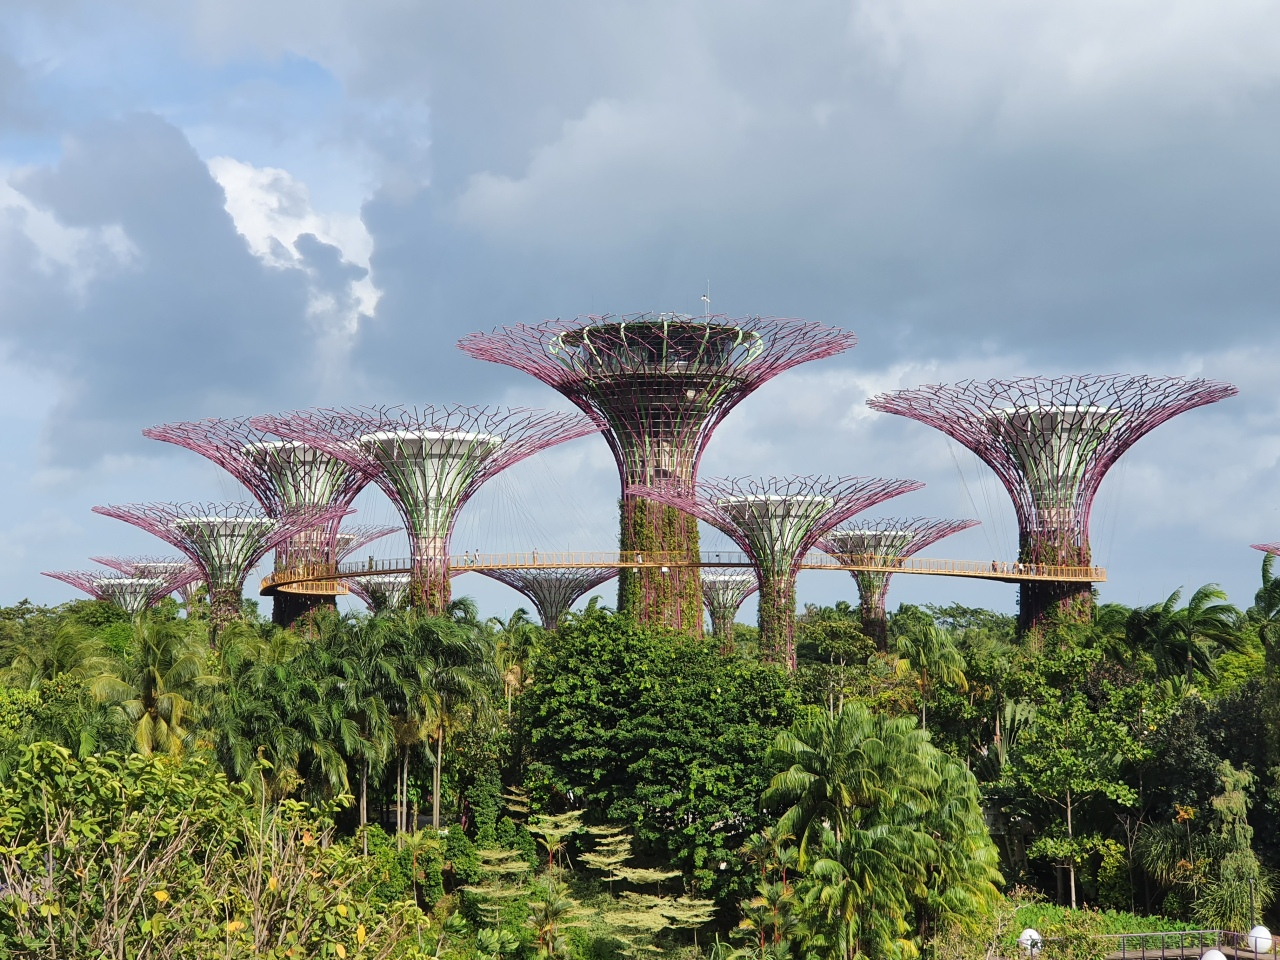 Day 174: Supertrees inSingapore